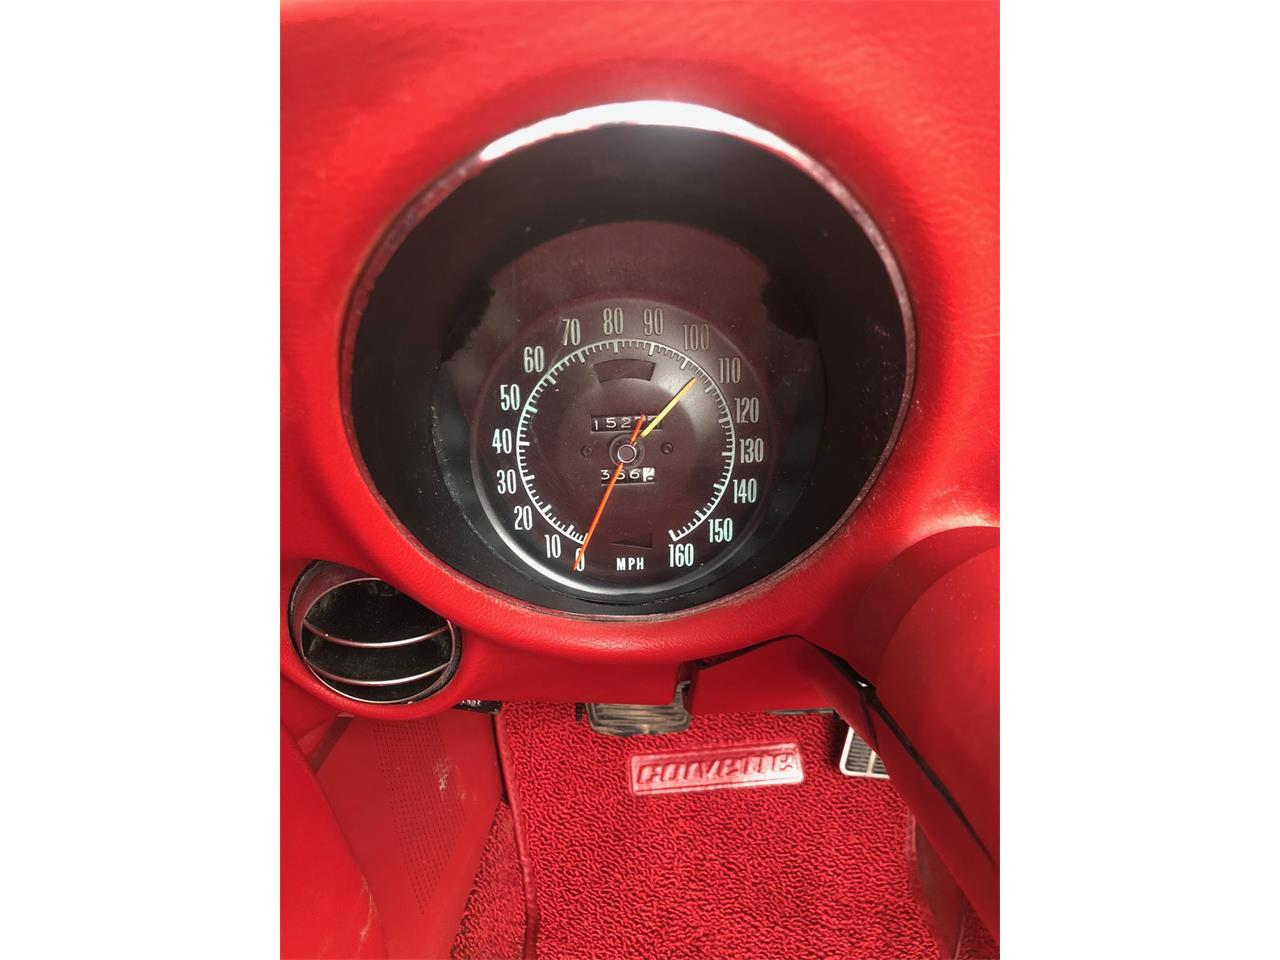 Large Picture of Classic 1968 Chevrolet Corvette located in Monroe North Carolina - $30,000.00 - QH2G